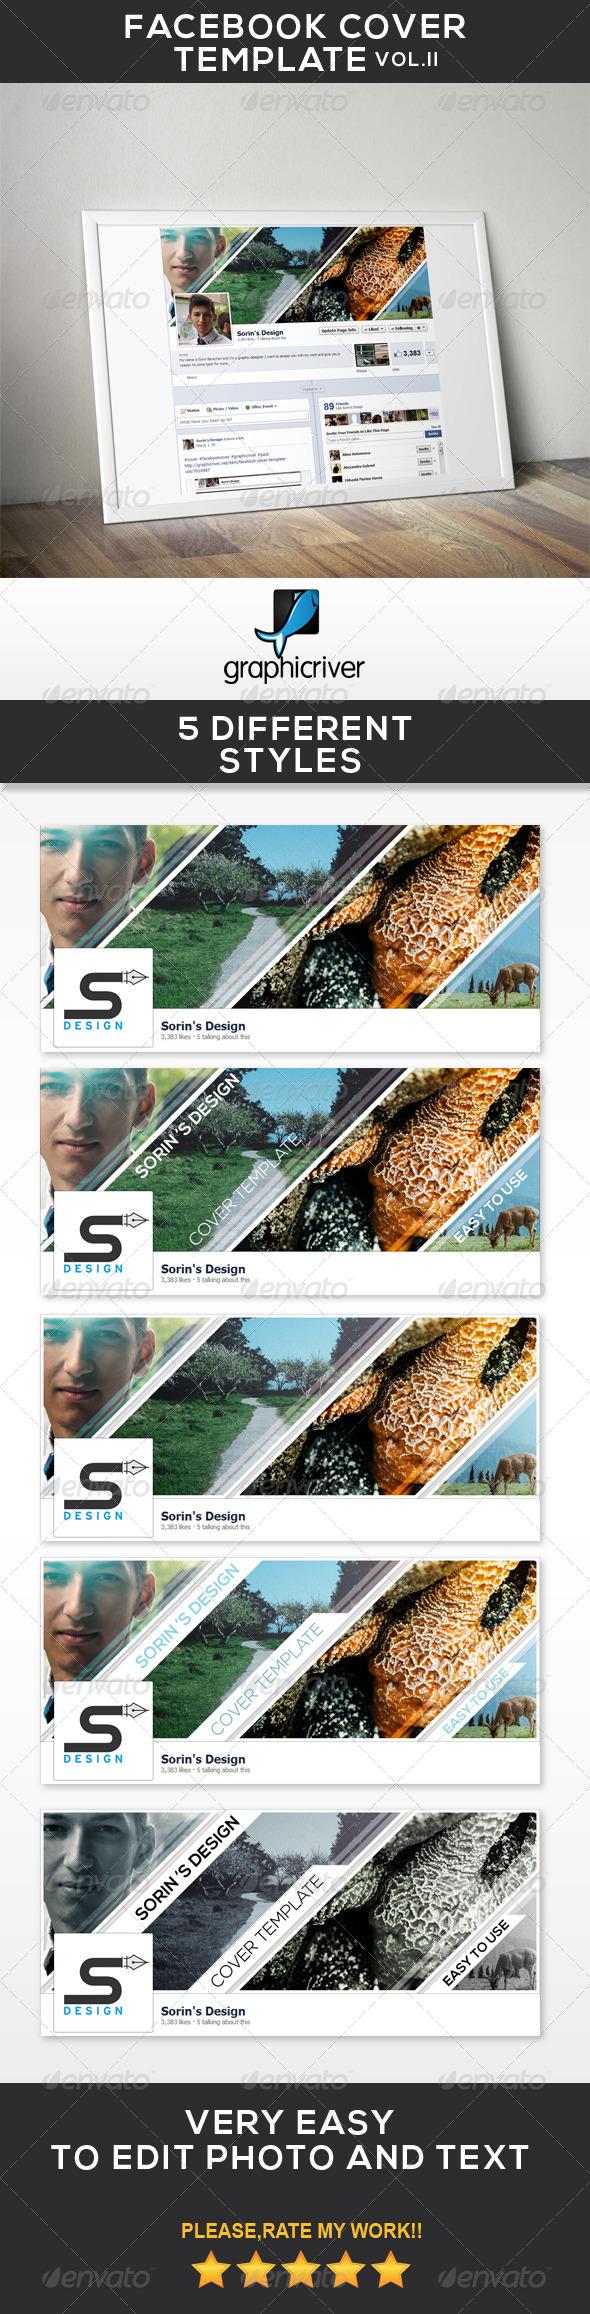 Facebook Cover Template Vol.II - Facebook Timeline Covers Social Media